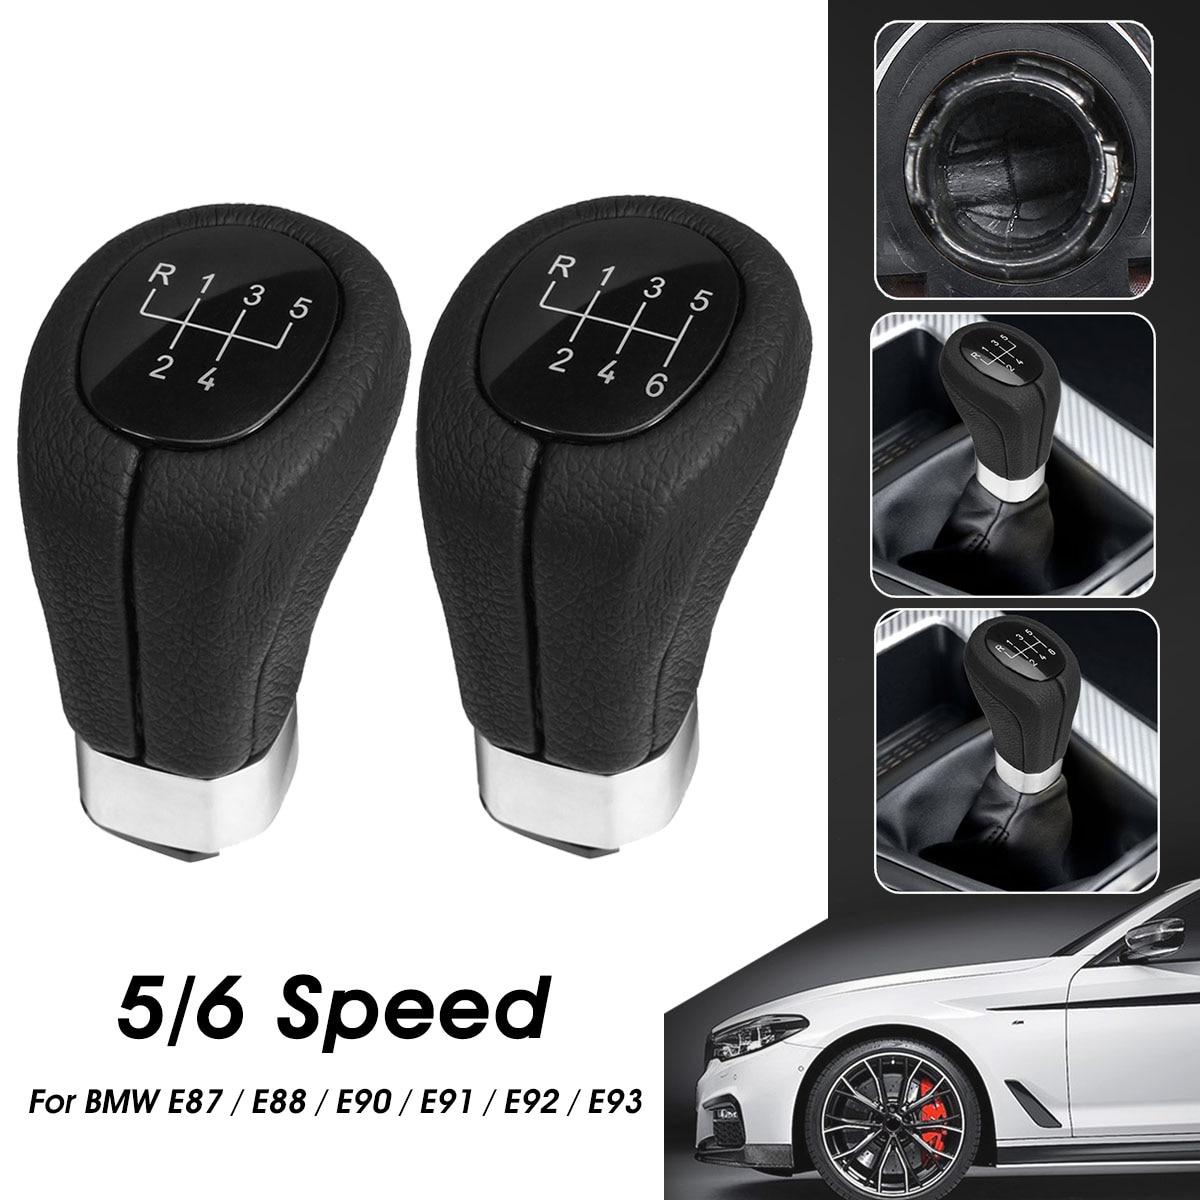 Gear Shift Knob Leather 5 Speed for BMW 1 3 Series E82 E88 E90 E91 E92 E93